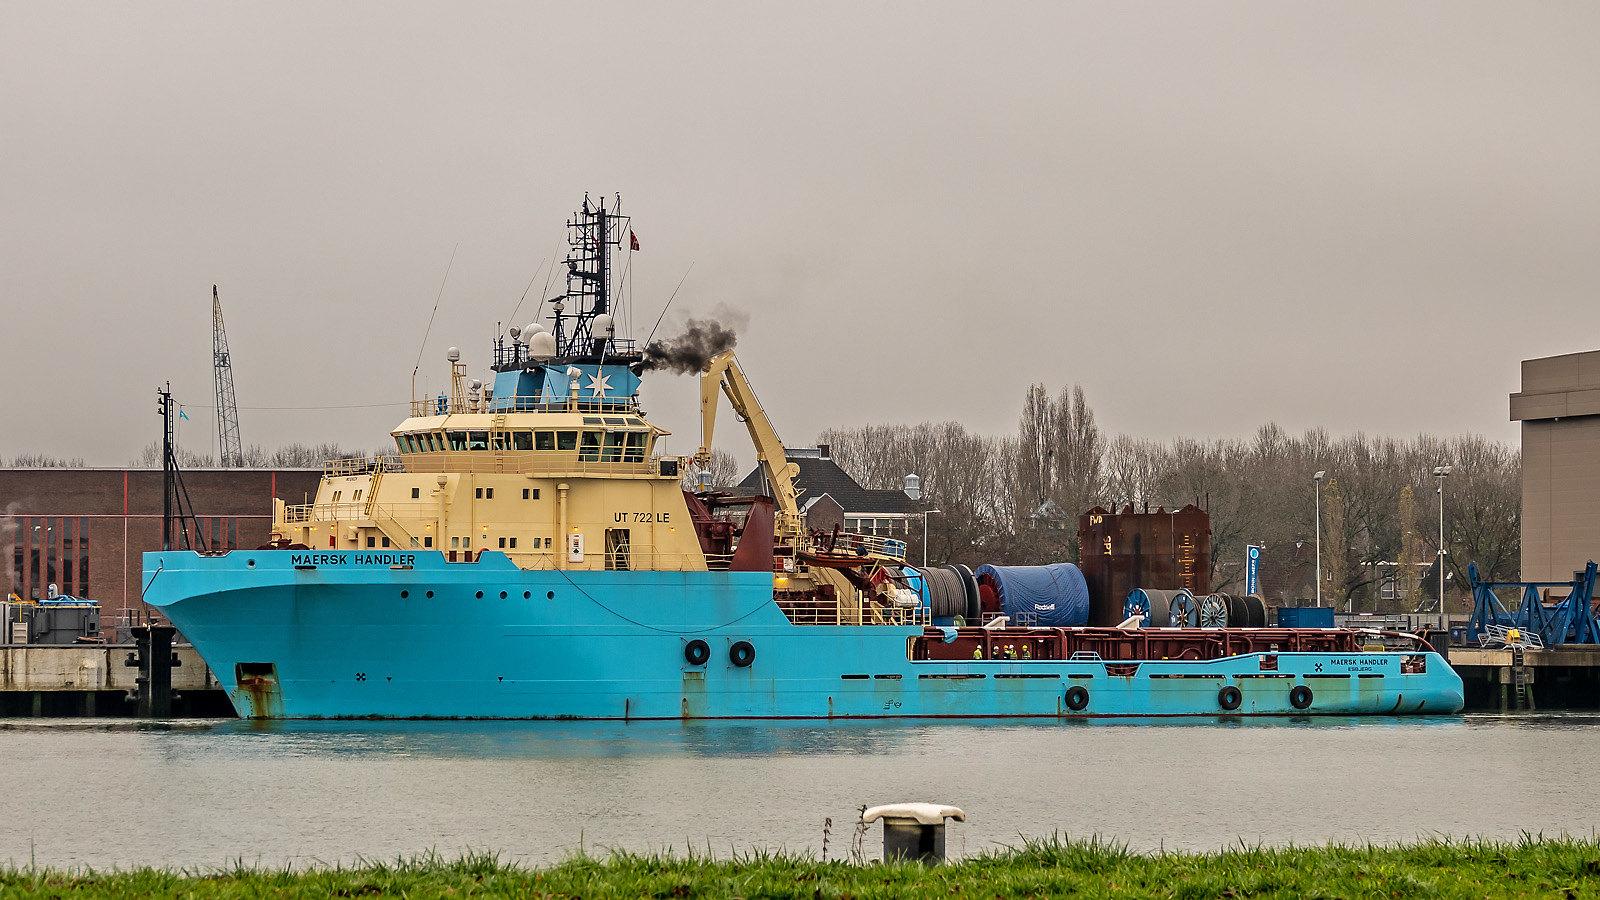 Maersk Handler